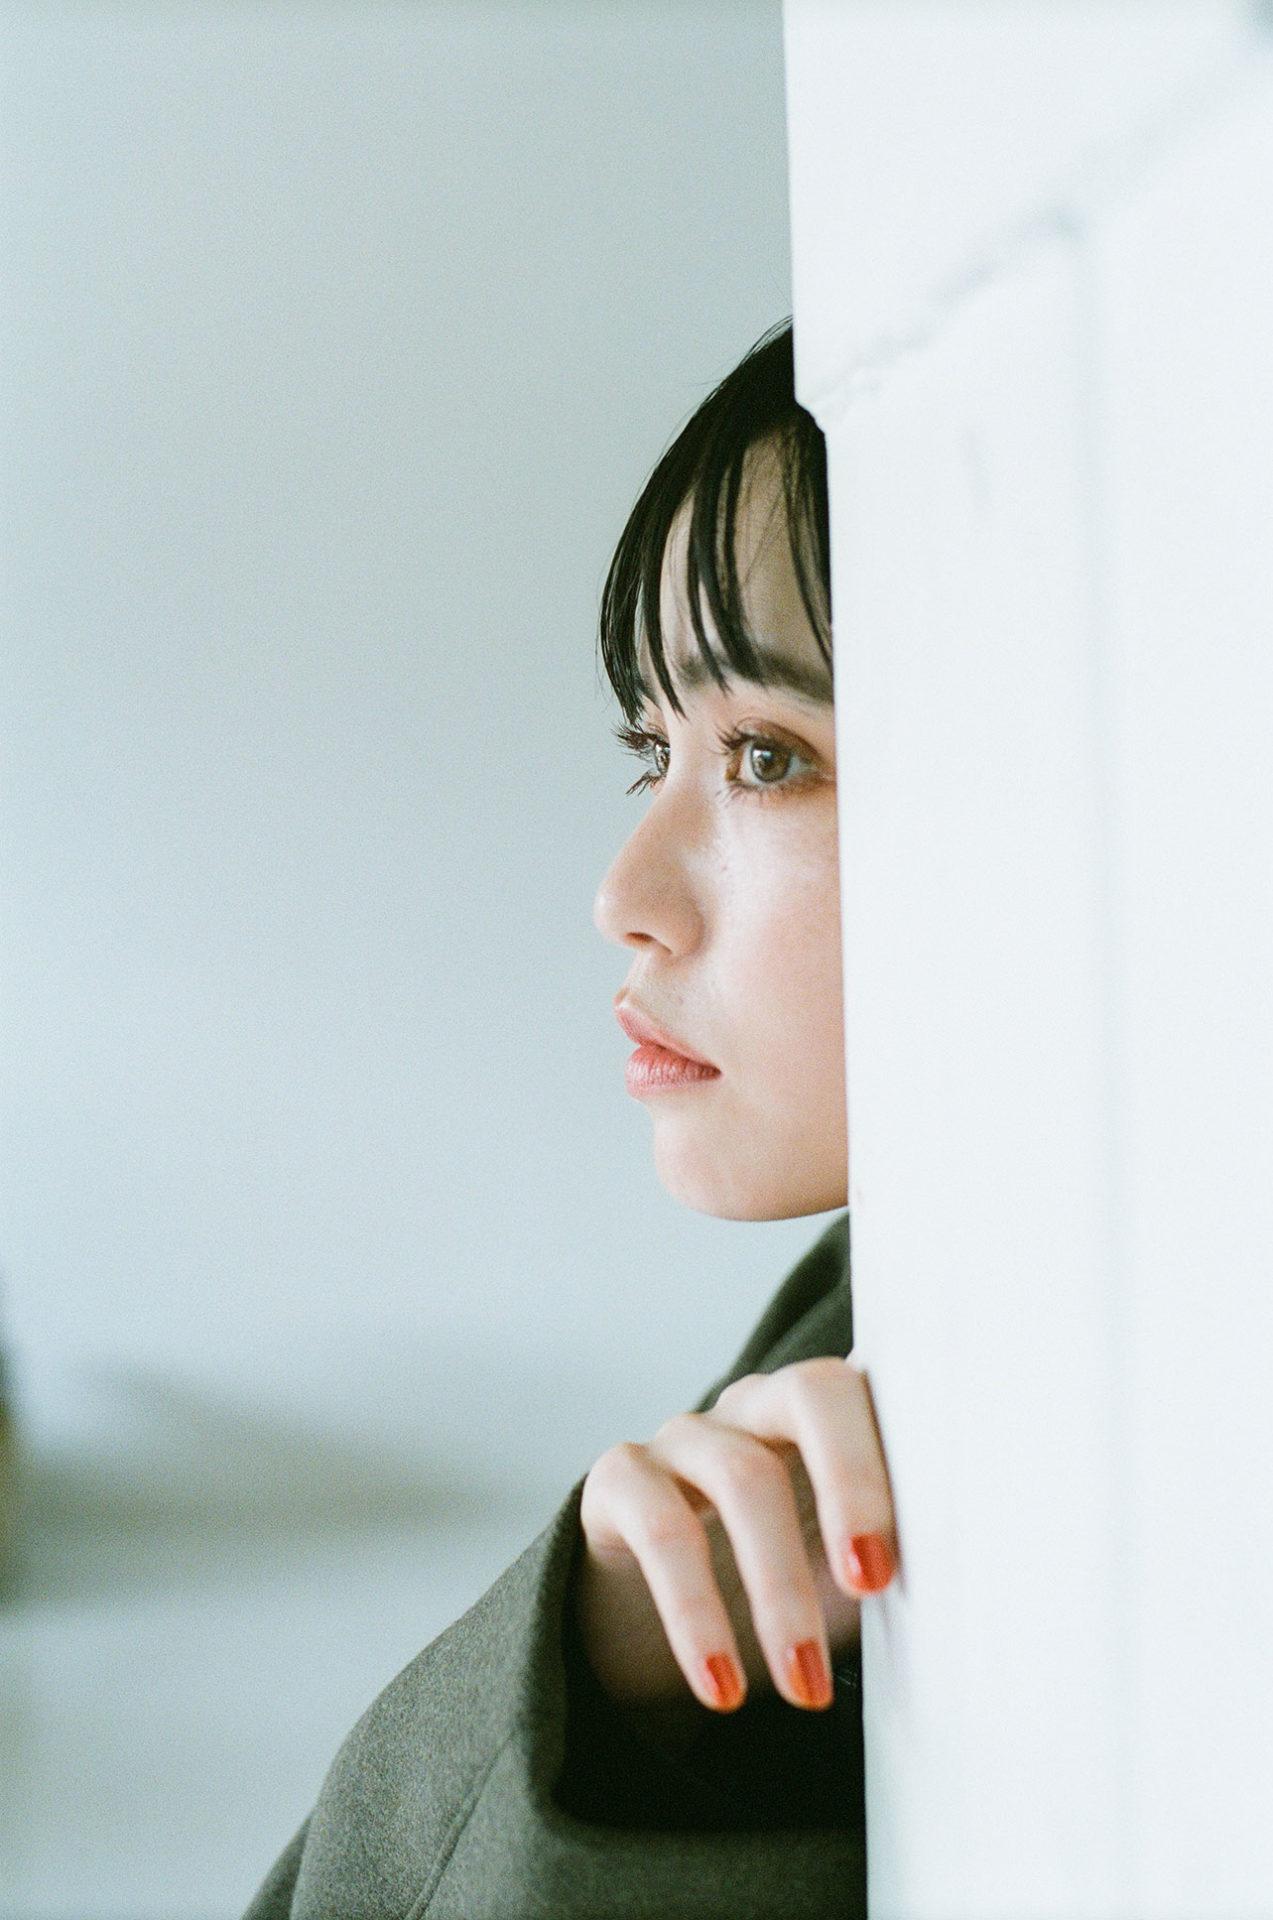 hair&make up tomoko okada stylist netsuki takano model yu hirukawa photographer yuya shimahara